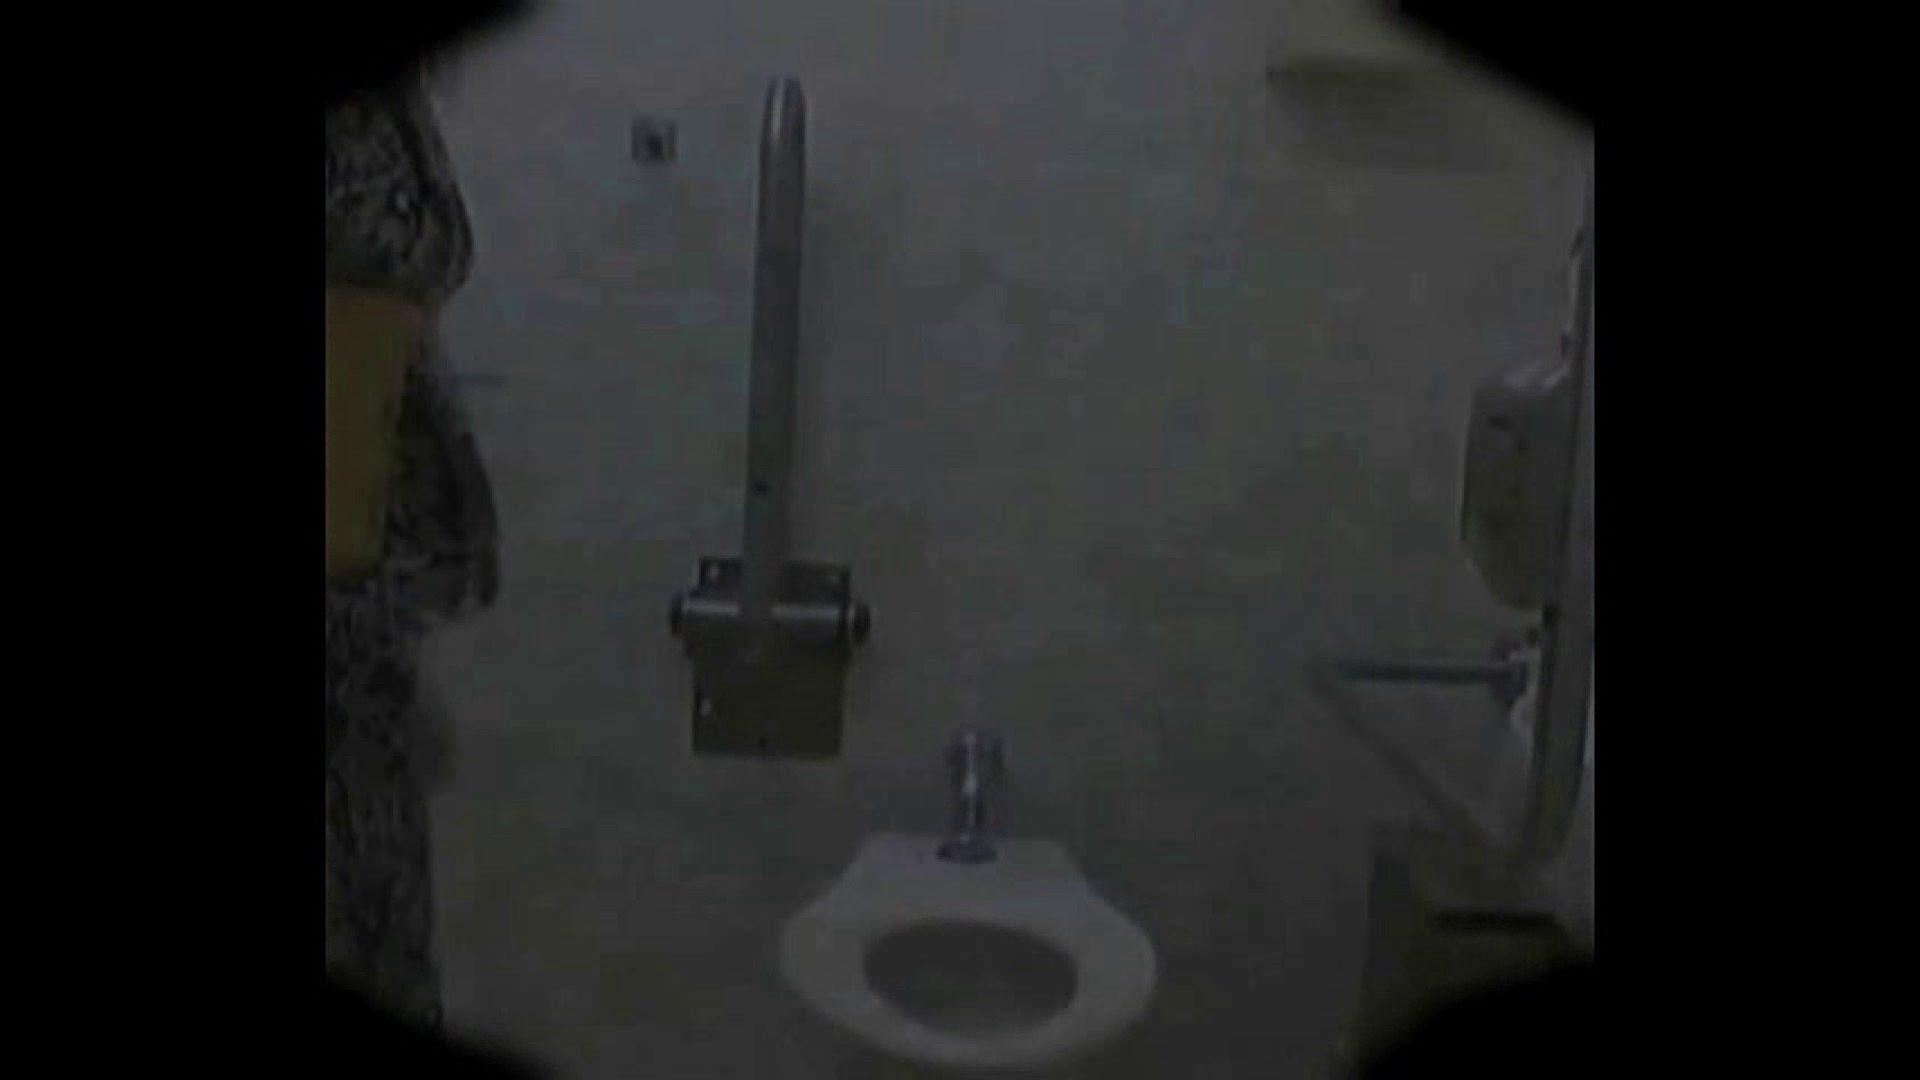 teen galトイレ覗き紙がナイ編‼vol.01 覗き 盗撮動画紹介 42連発 11